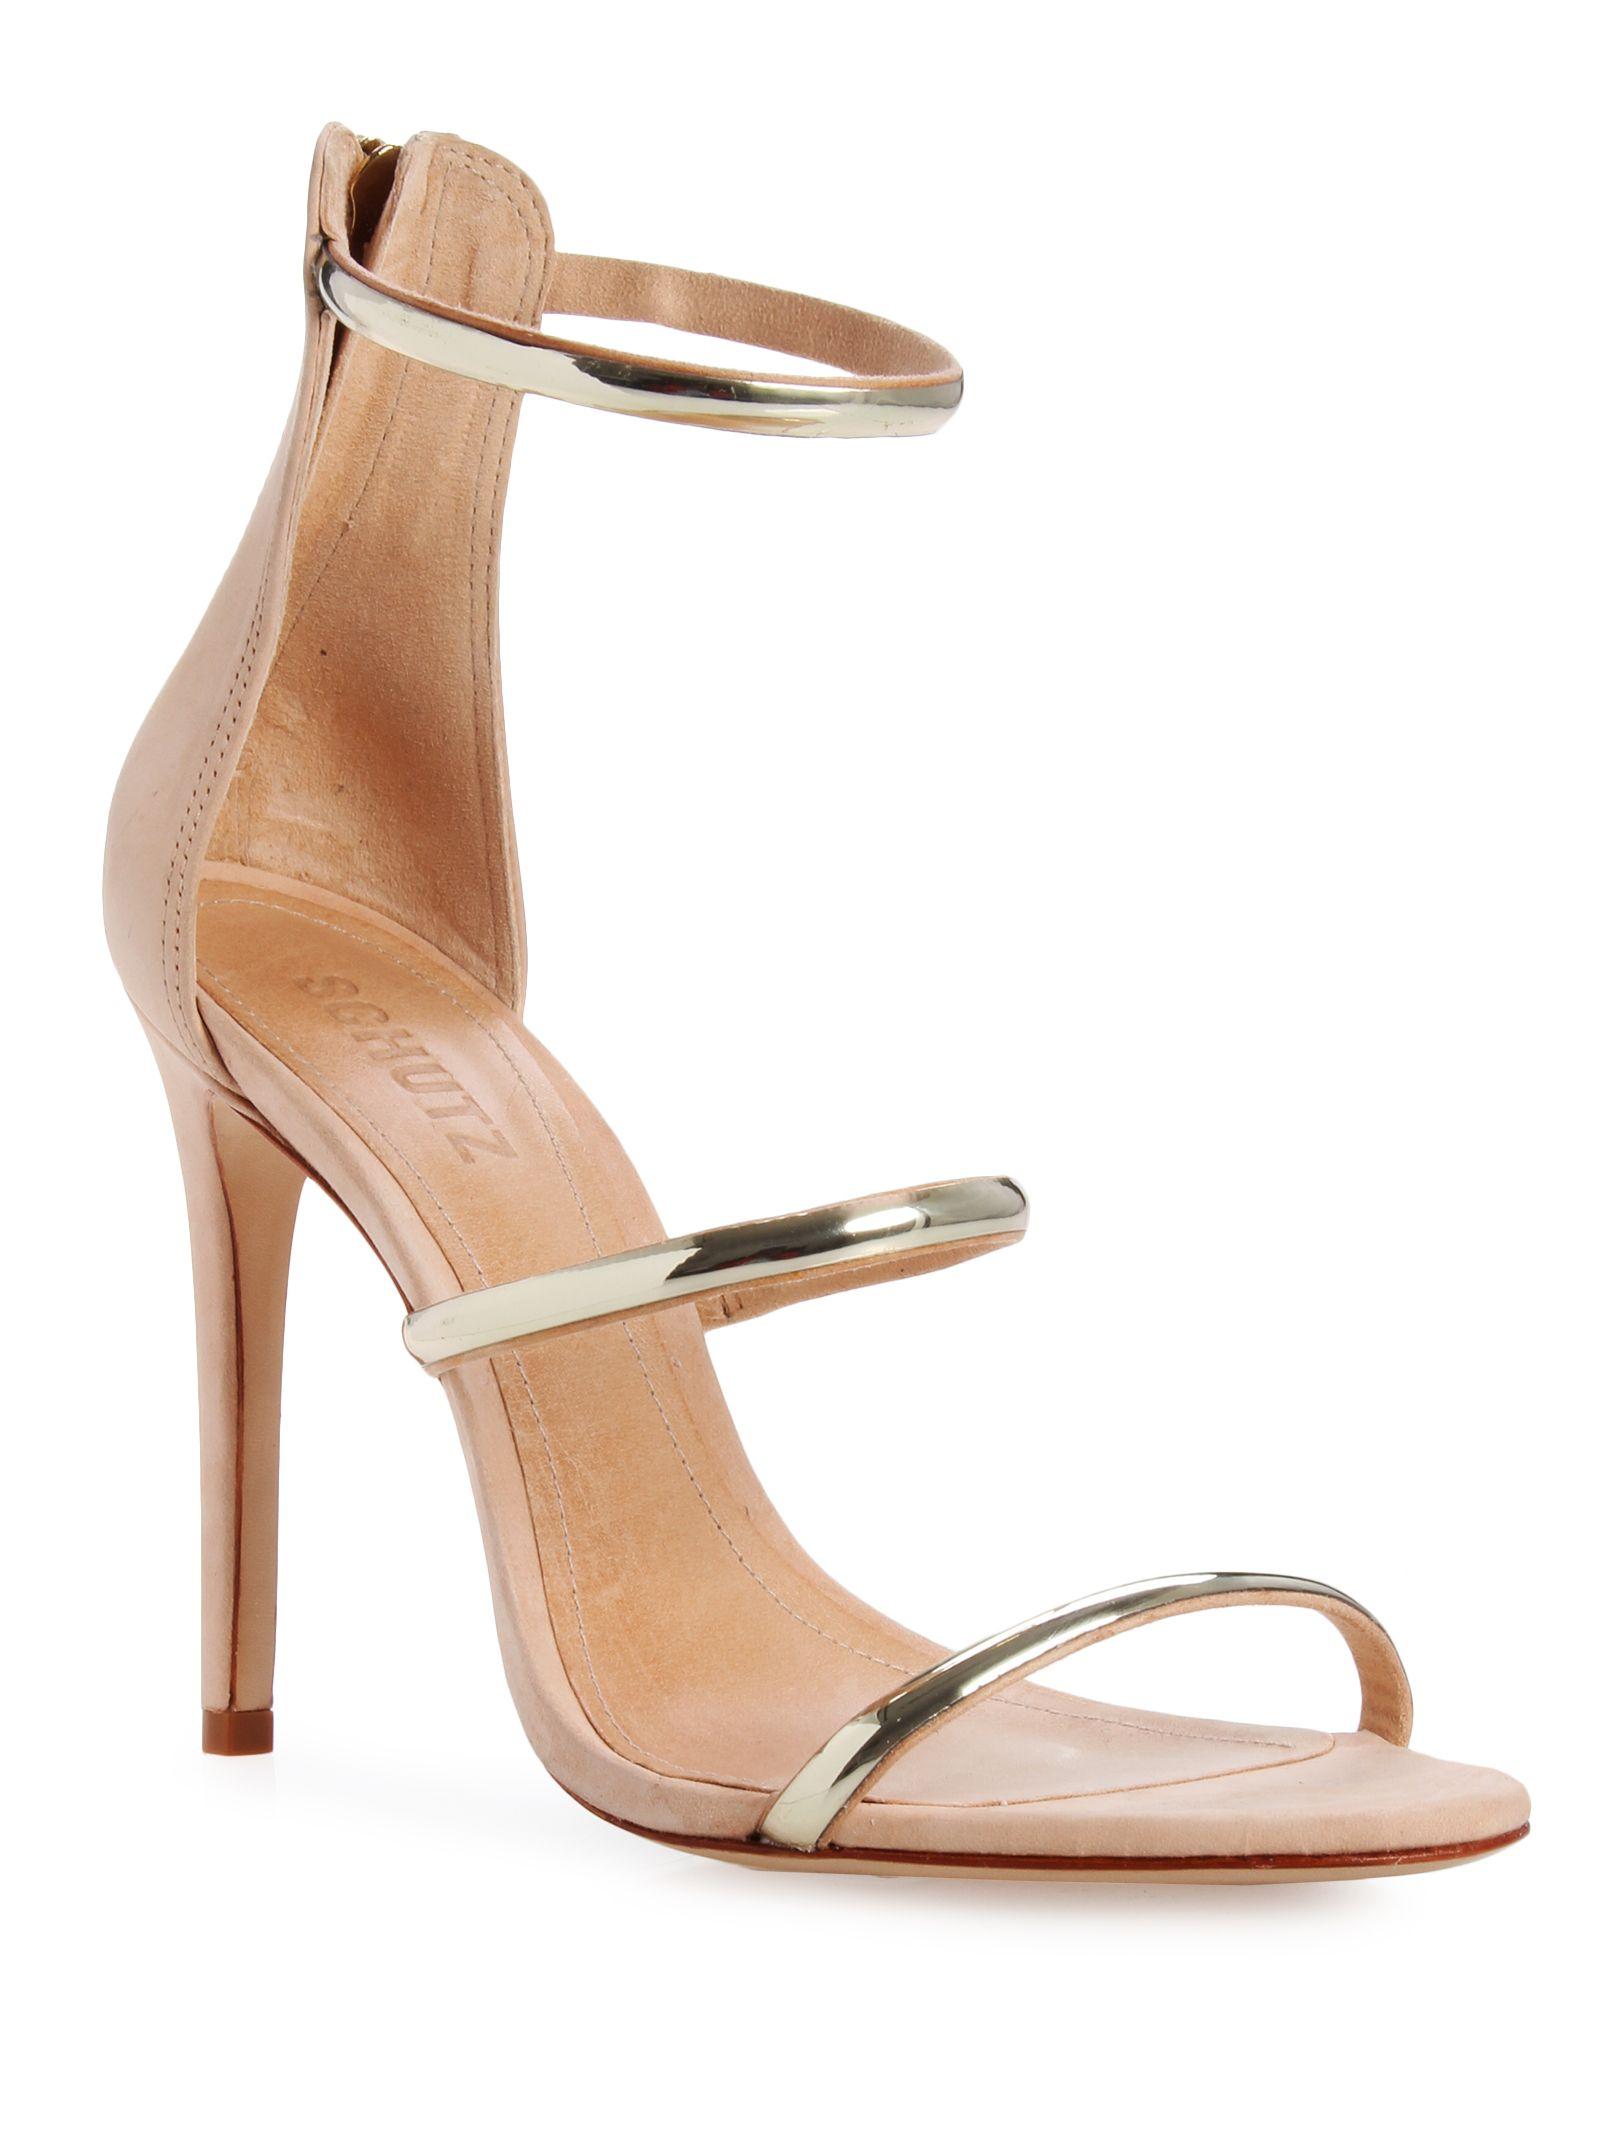 4d4829ee7 Sandália salto alto strap - nude schutz | shoes Schutz | Shutz ...